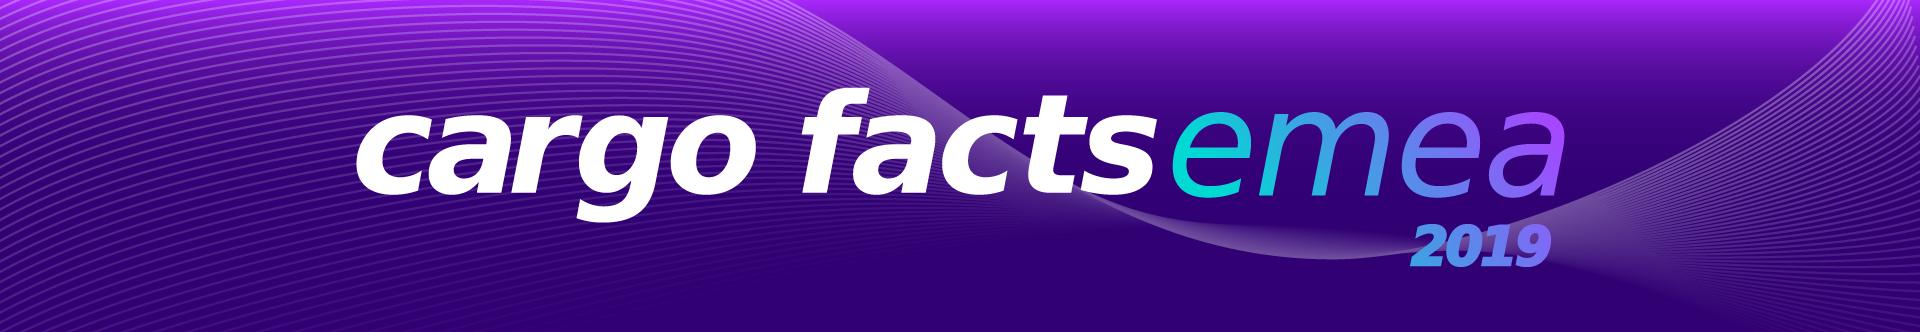 Cargo Facts EMEA 2019